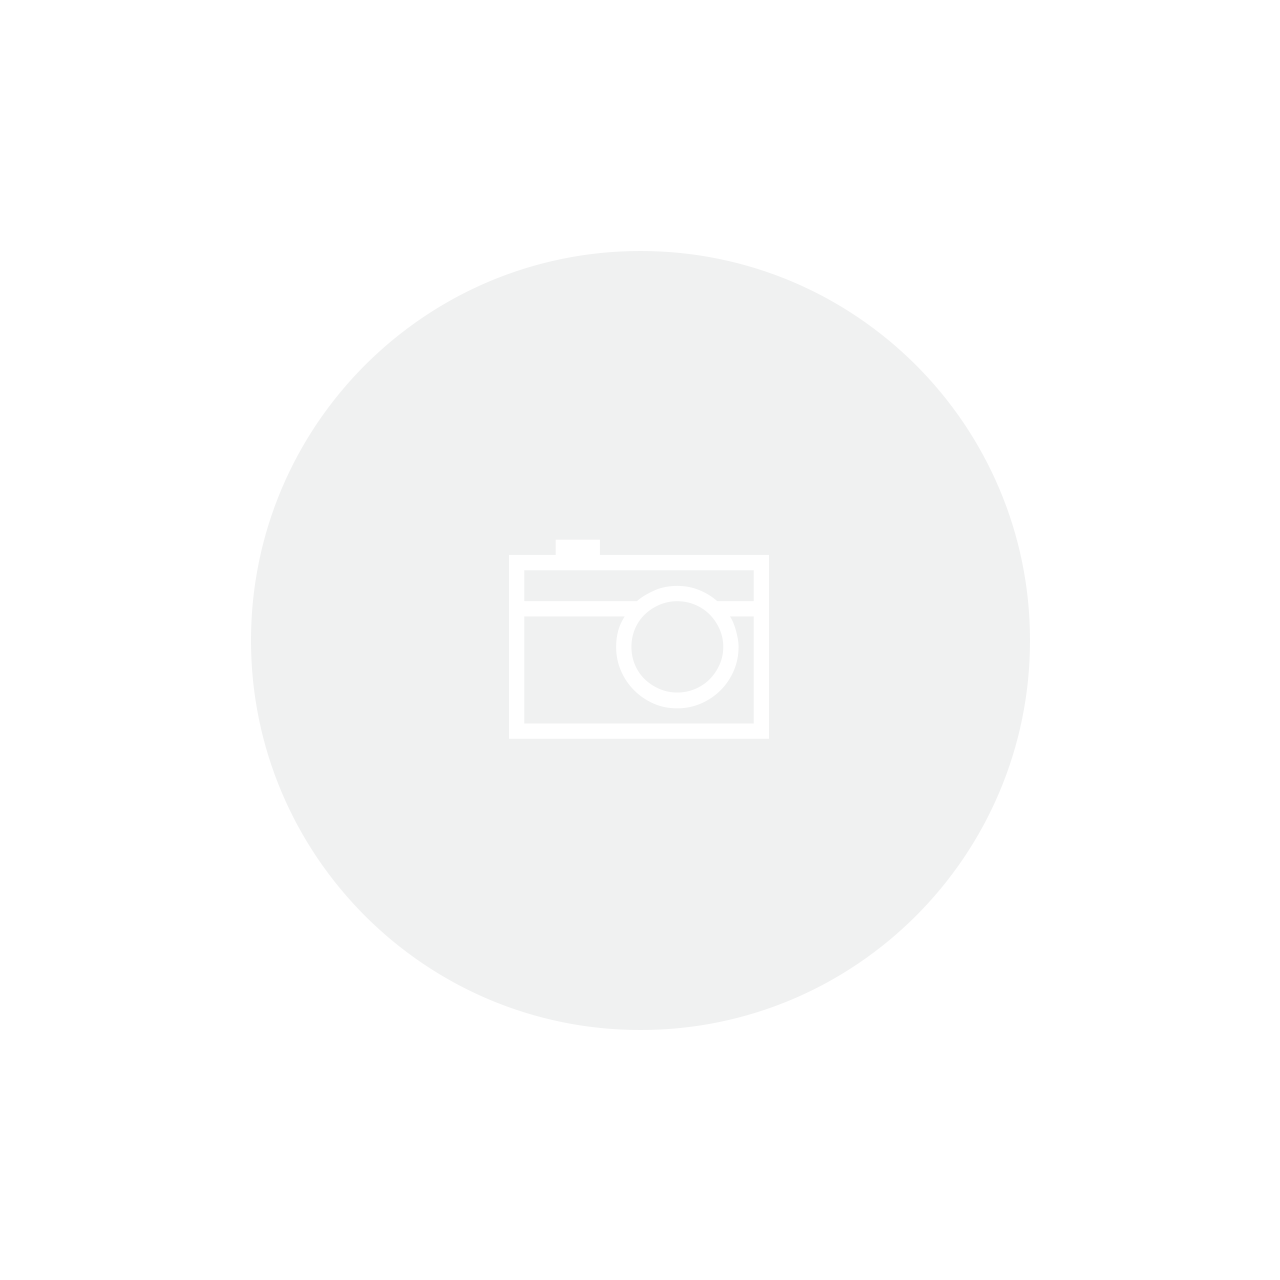 Farinheira 0,68 Quadratatramontina